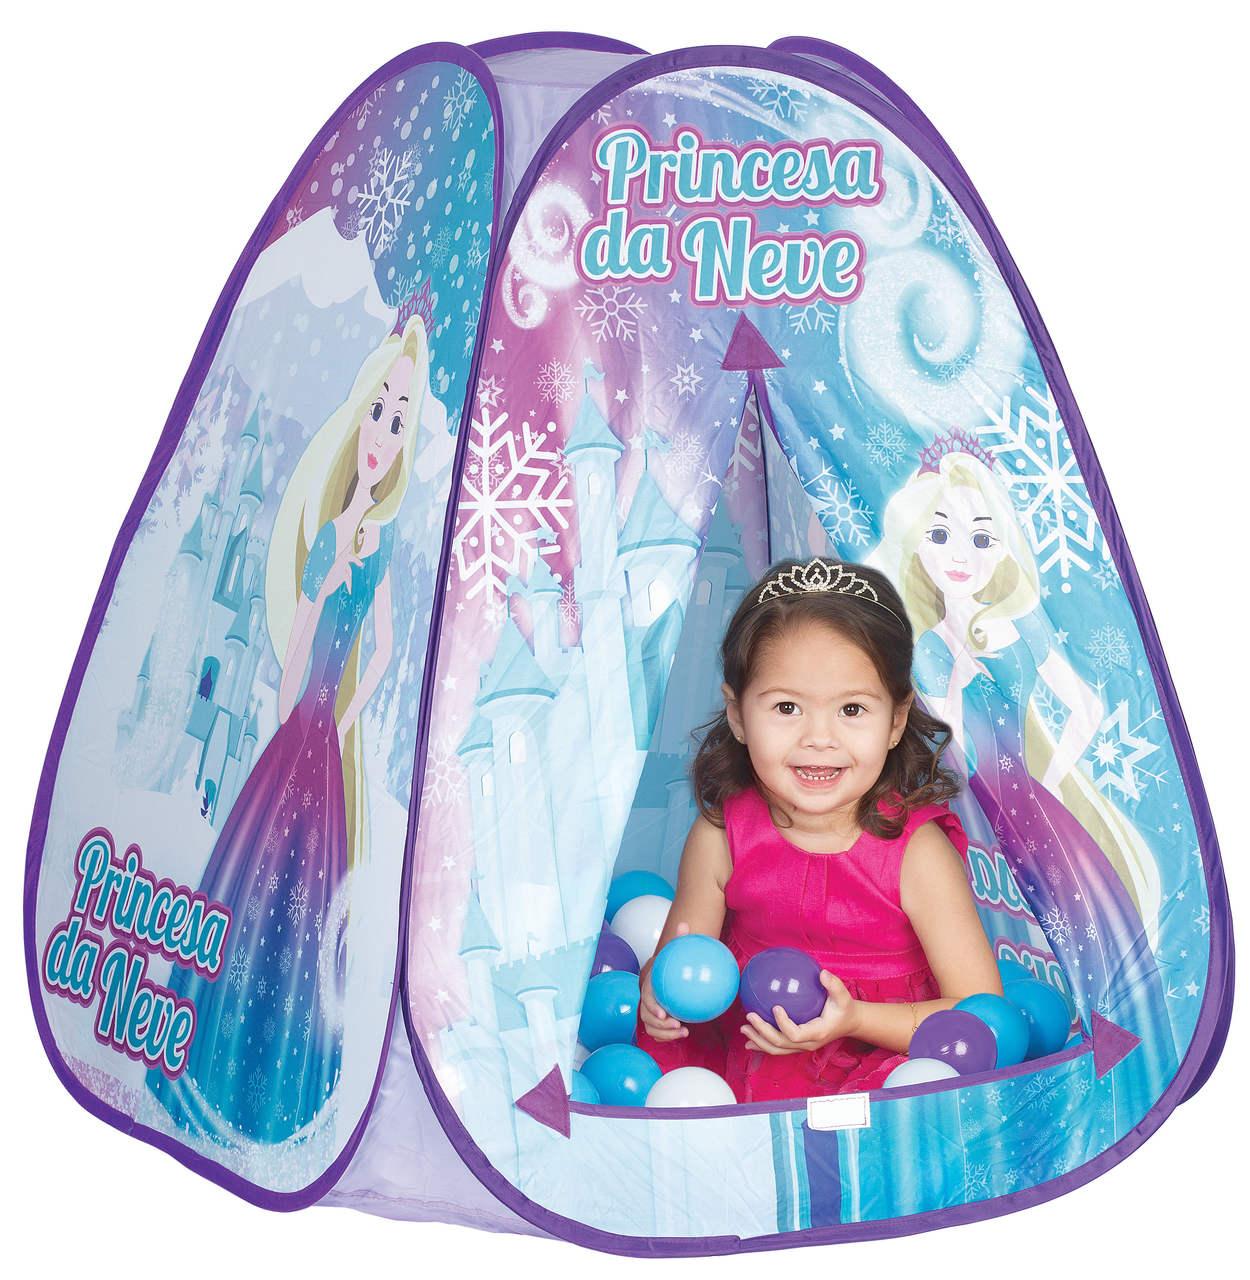 Toca Princesa Da Neve Monta Fácil Sacola 820-8 Braskit